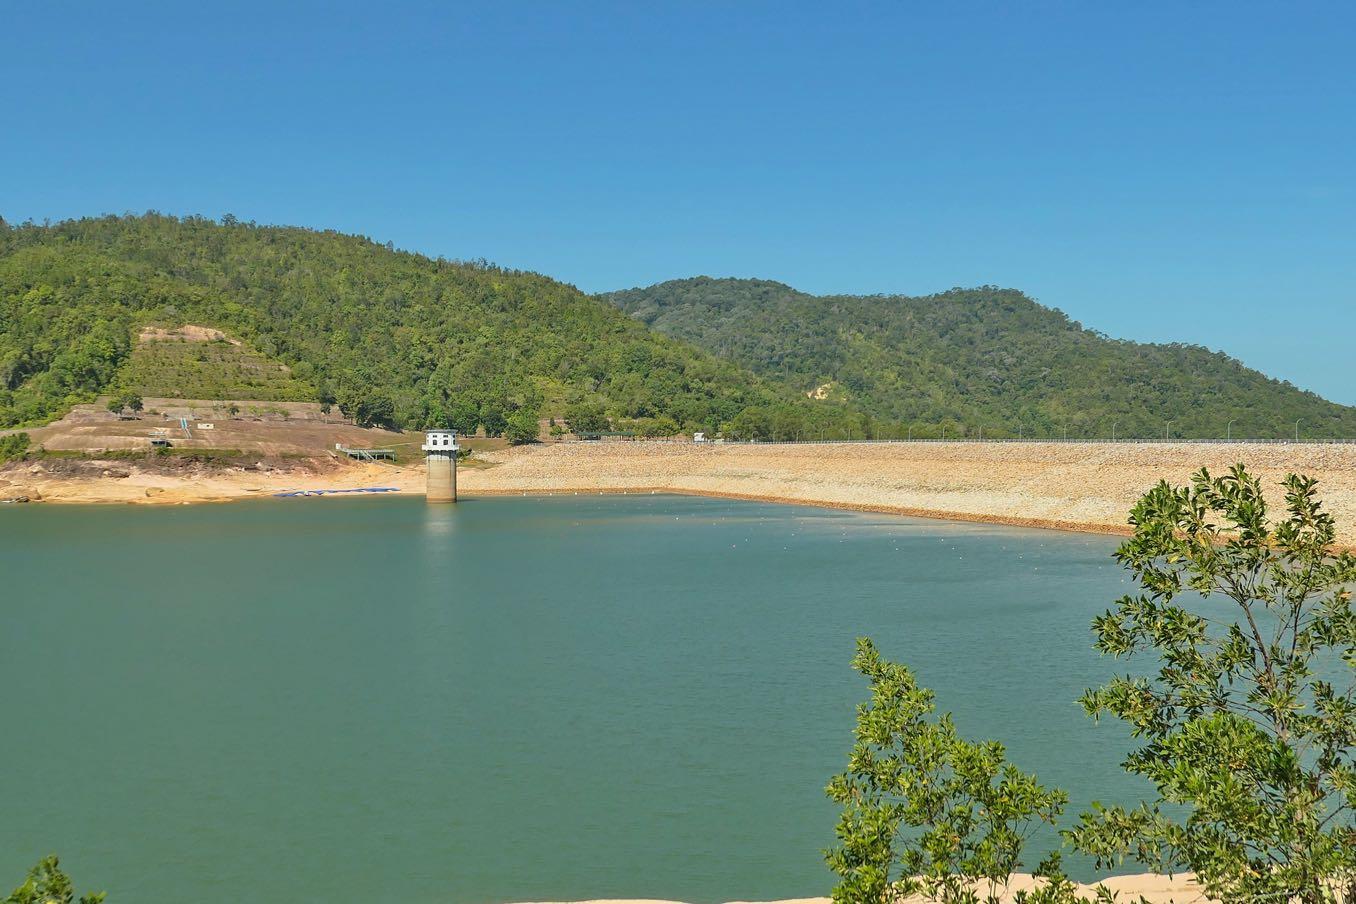 Teluk Bahang Damというダム